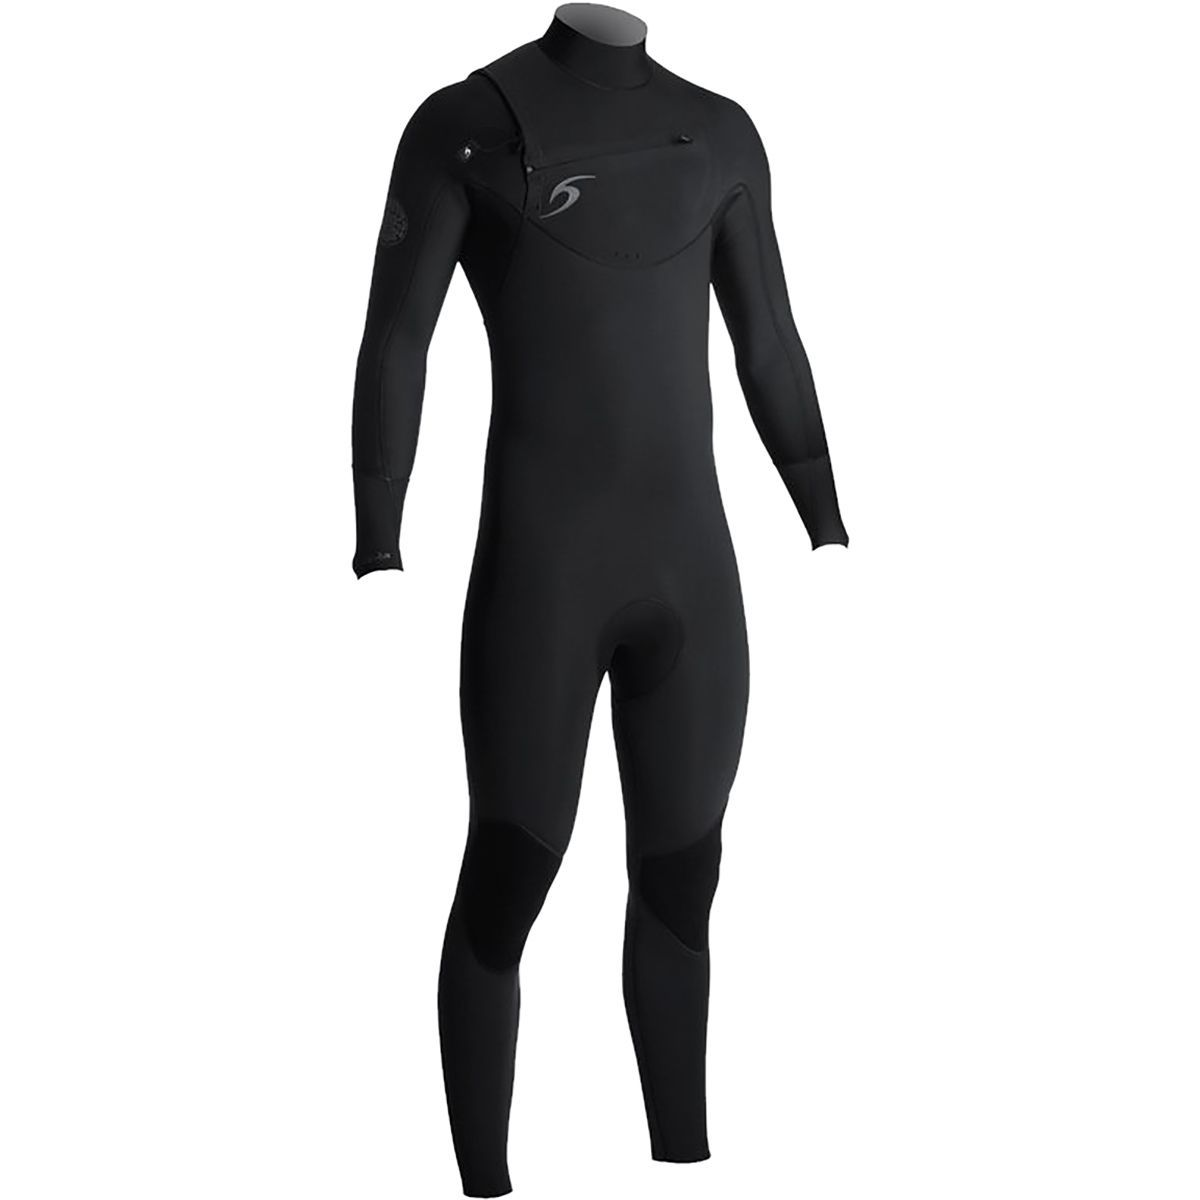 Rip Curl Dawn Patrol 3/2 Chest-Zip Wetsuit - Men's